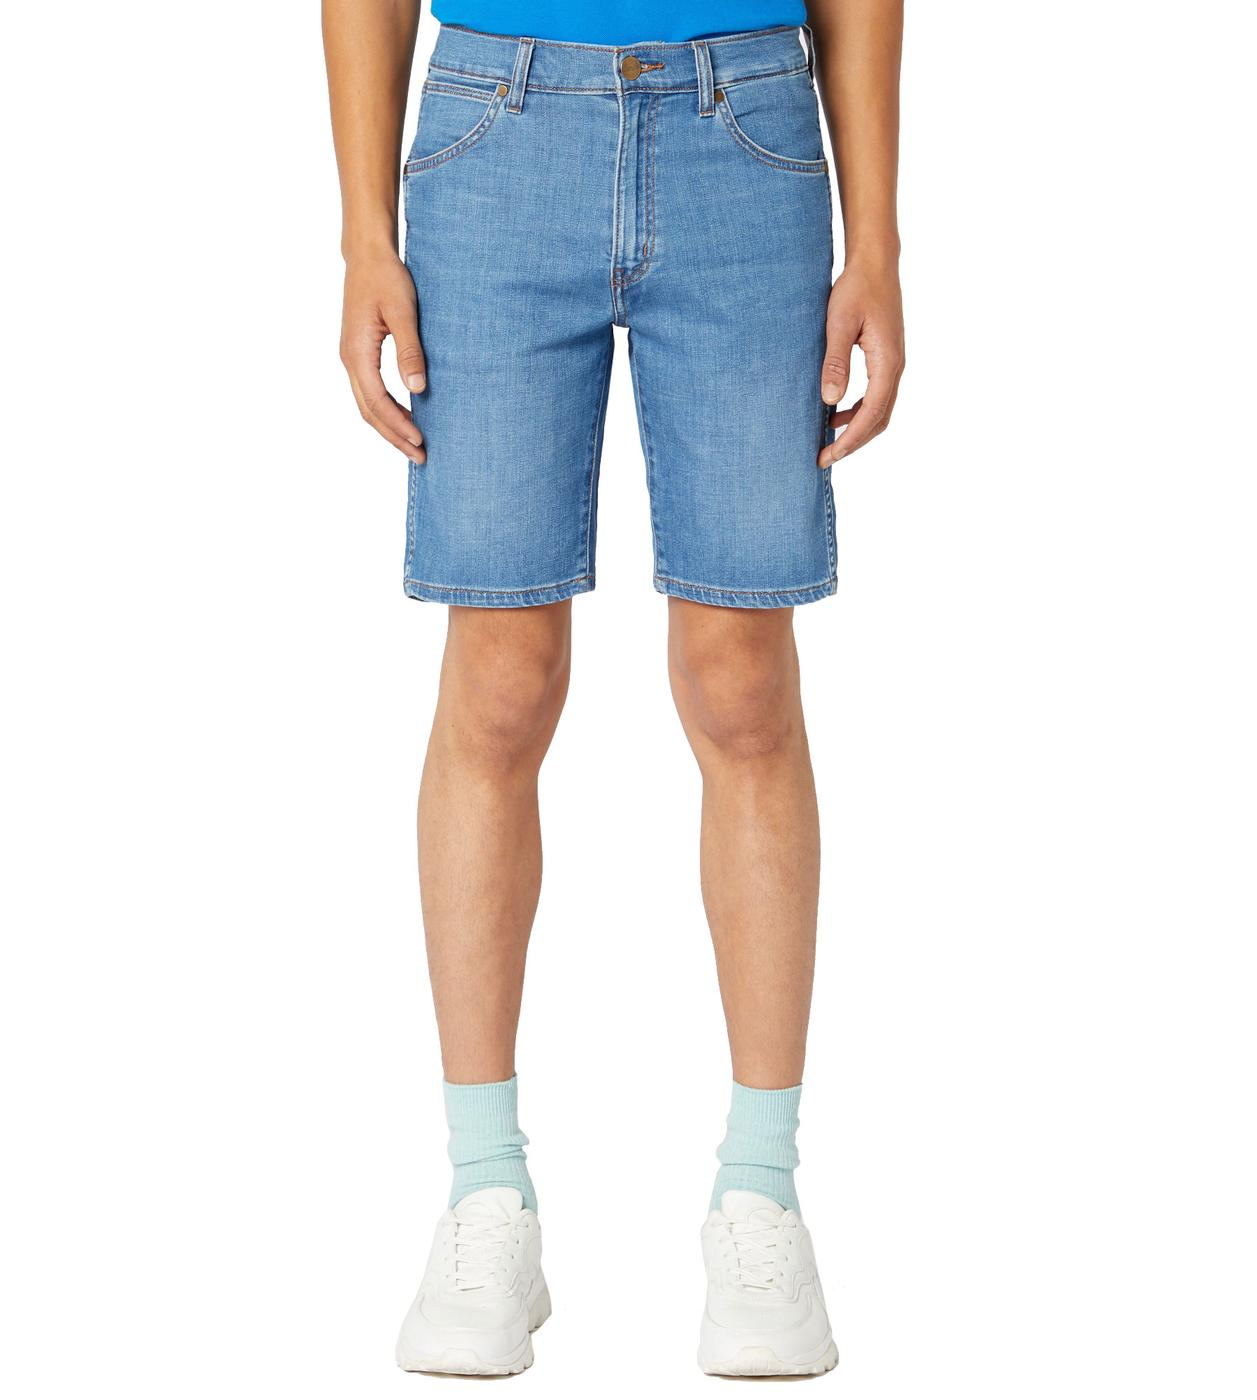 WRANGLER Retro 5 Pocket Denim Shorts EL ZONDAc